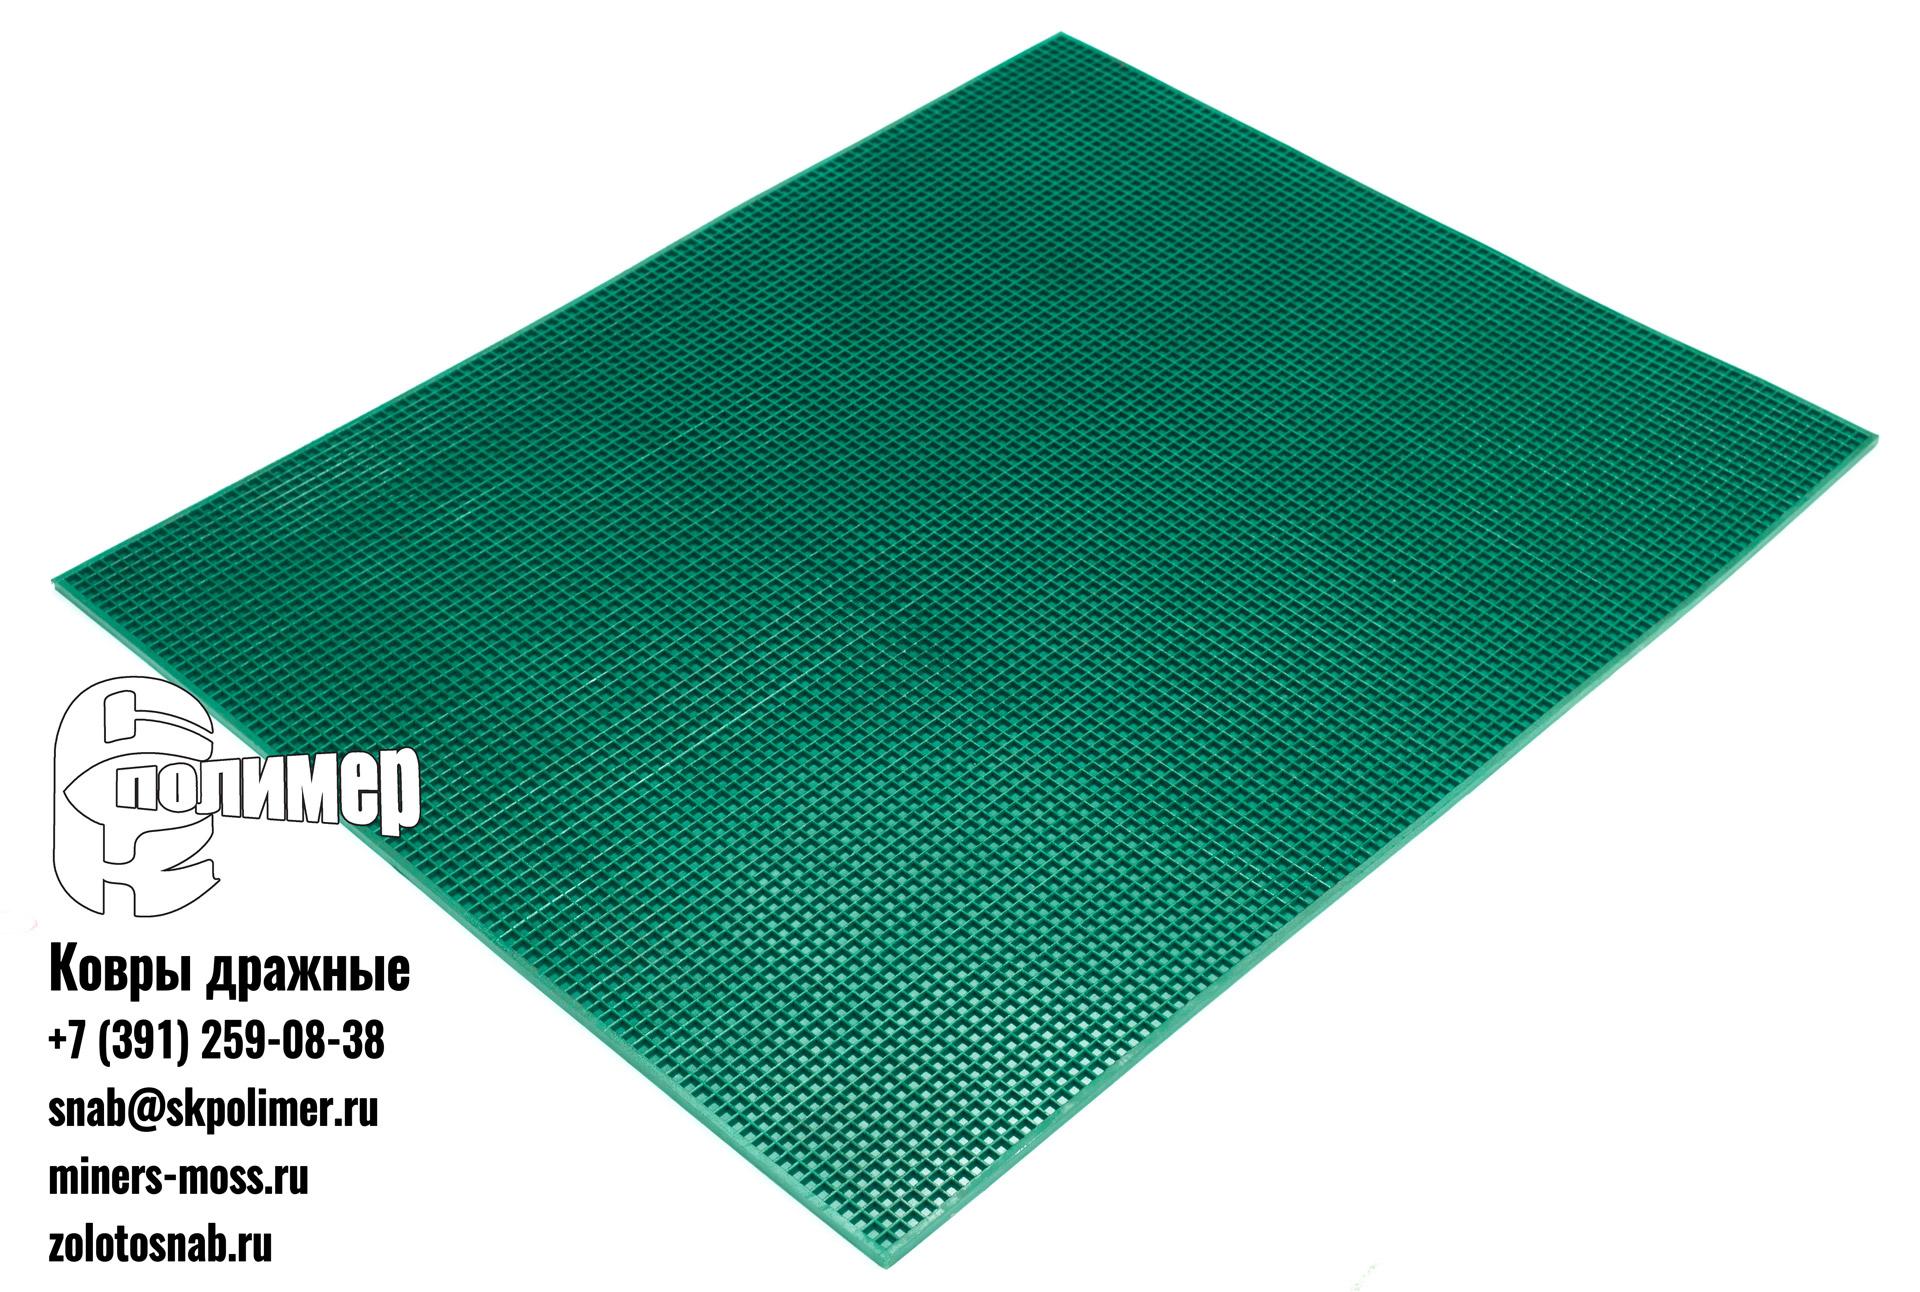 ковры дражные цветные зеленый 1000х800